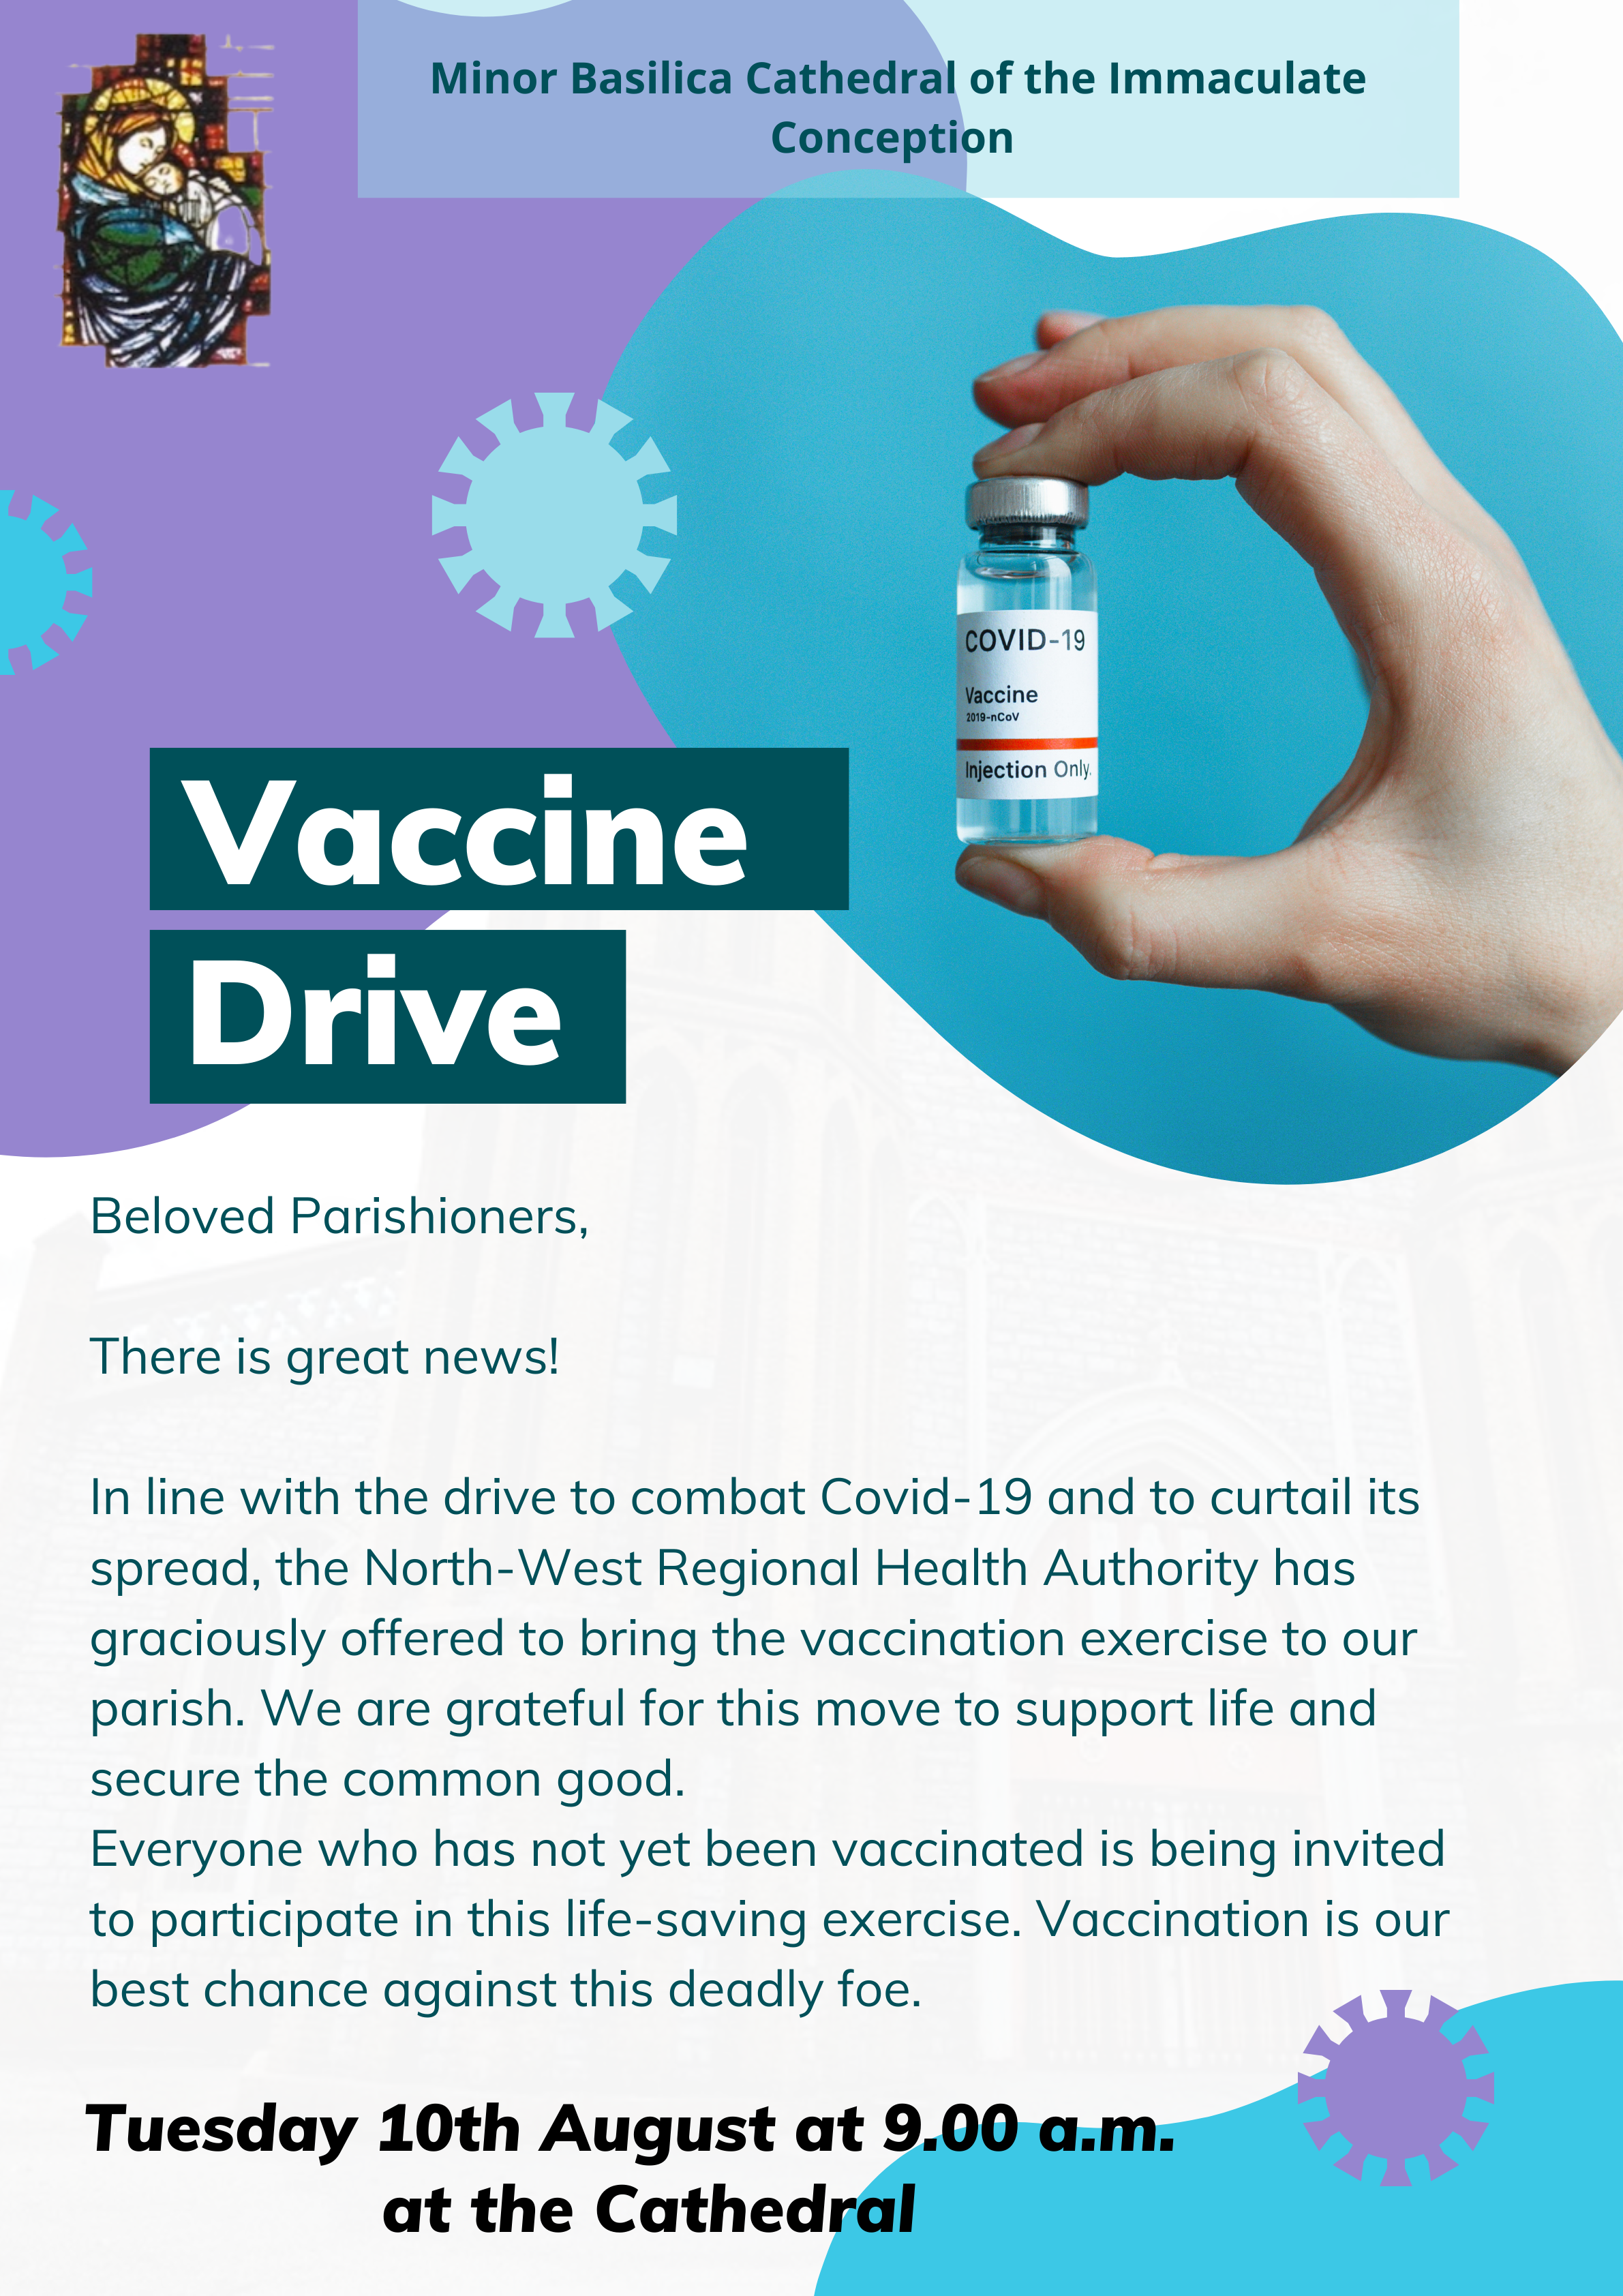 Vaccine drive